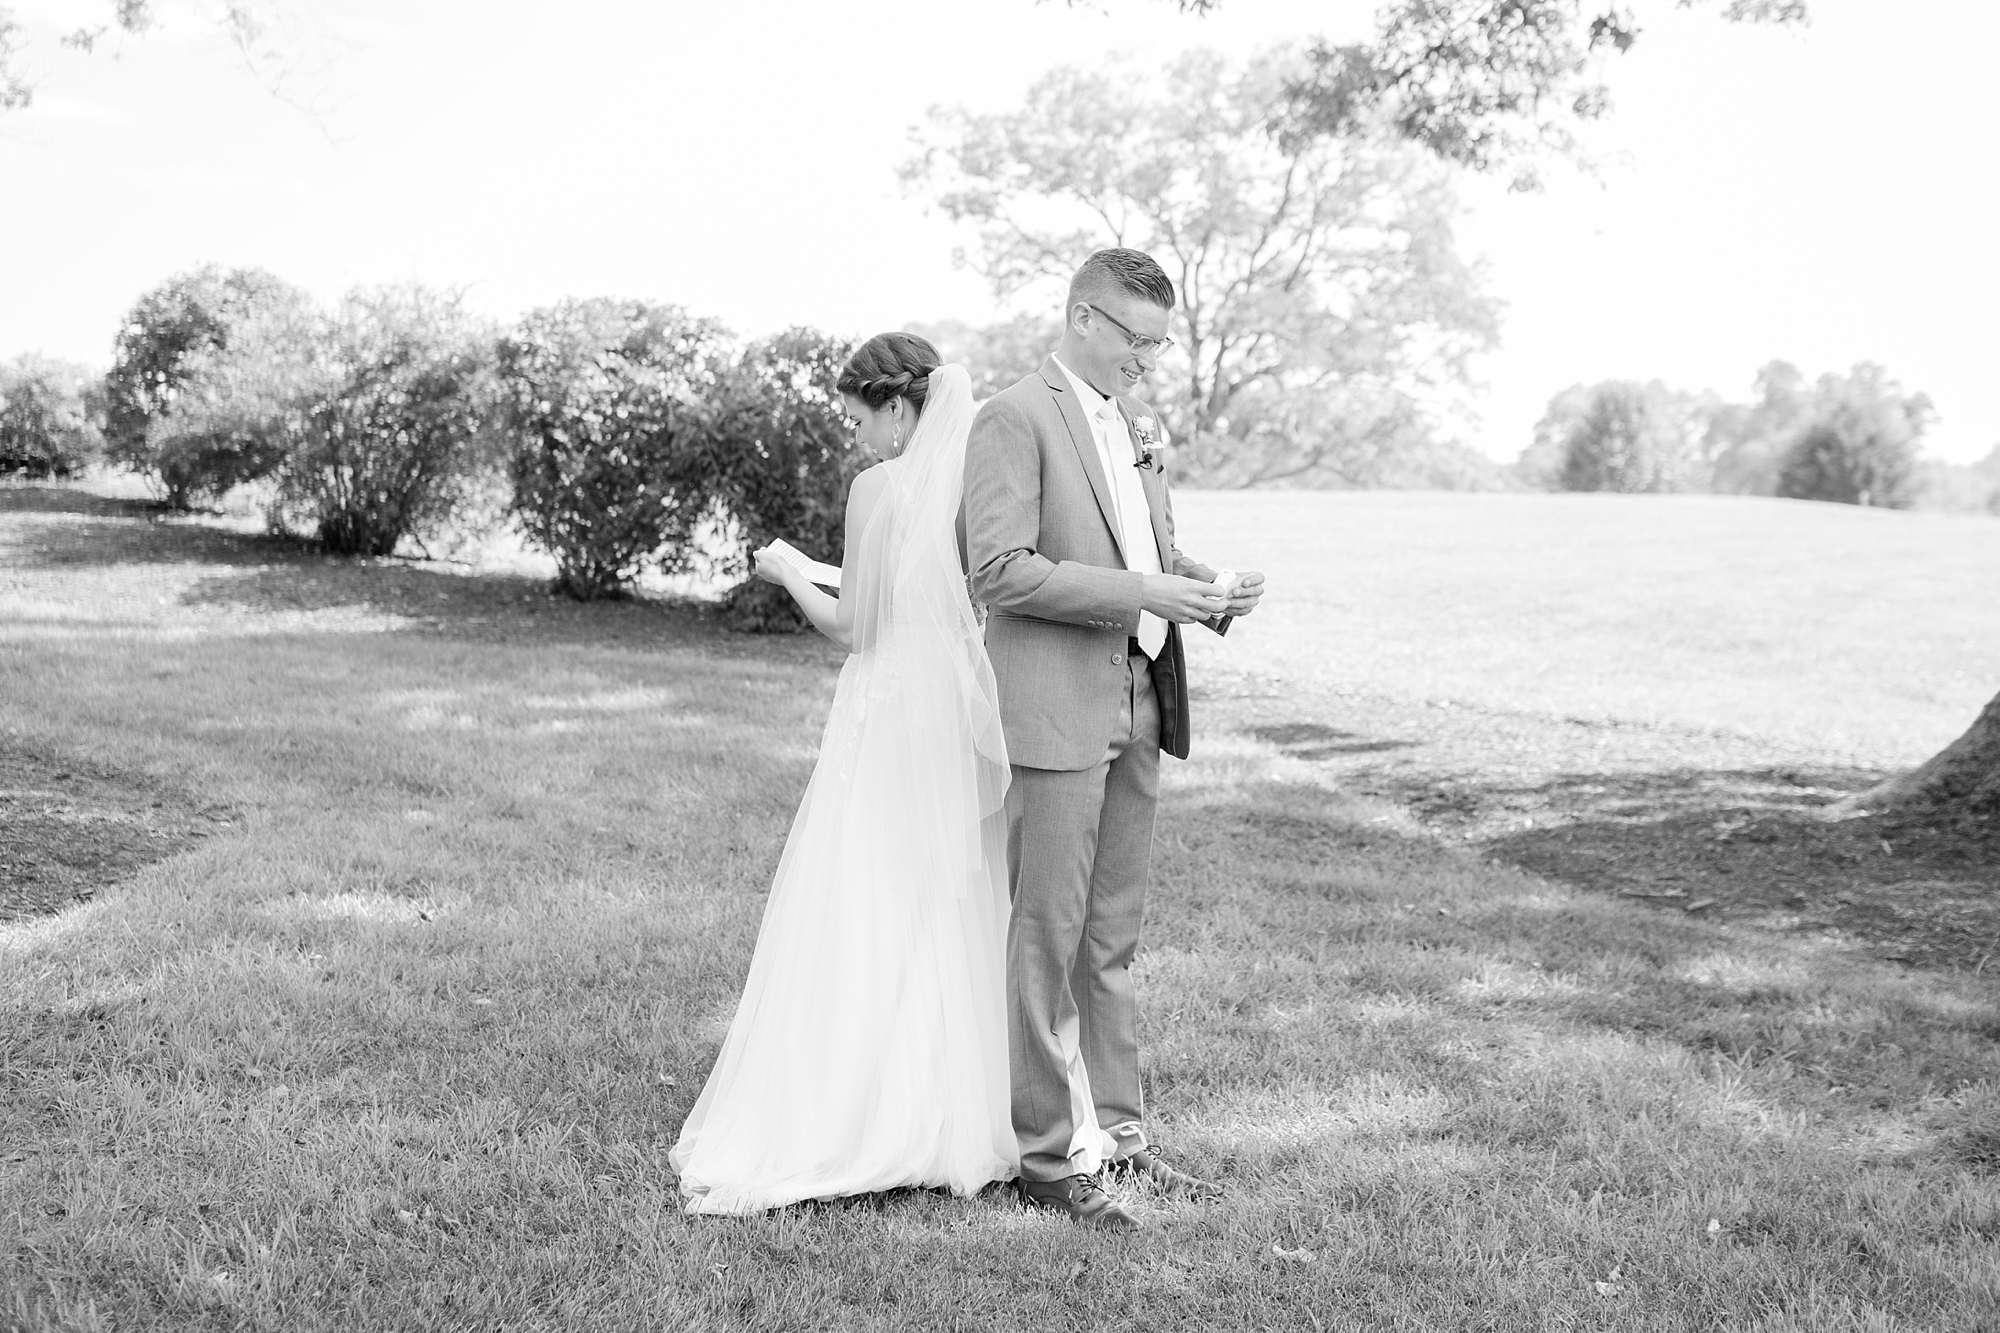 Tomaszewski 2-First Look-686_anna grace photography baltimore maryland wedding photographer rockland estates wedding photo.jpg